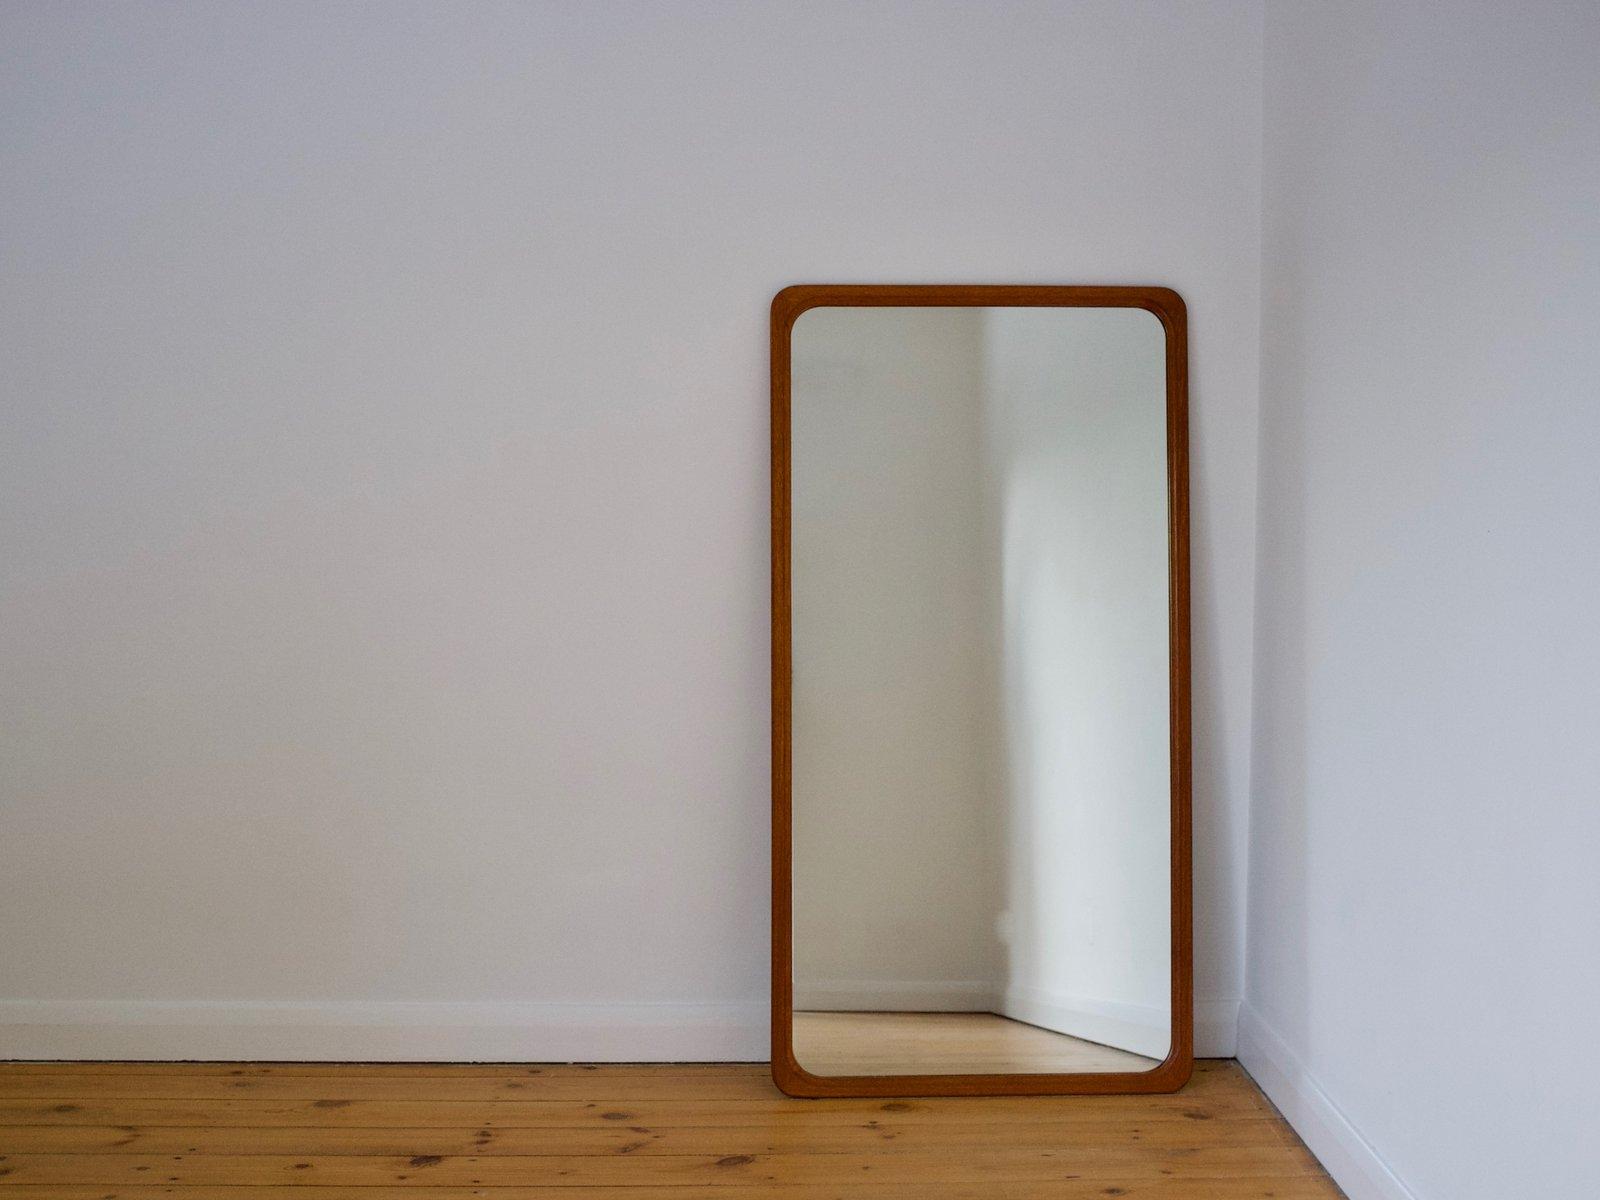 gro er d nischer wandspiegel mit teak rahmen 1960er bei. Black Bedroom Furniture Sets. Home Design Ideas